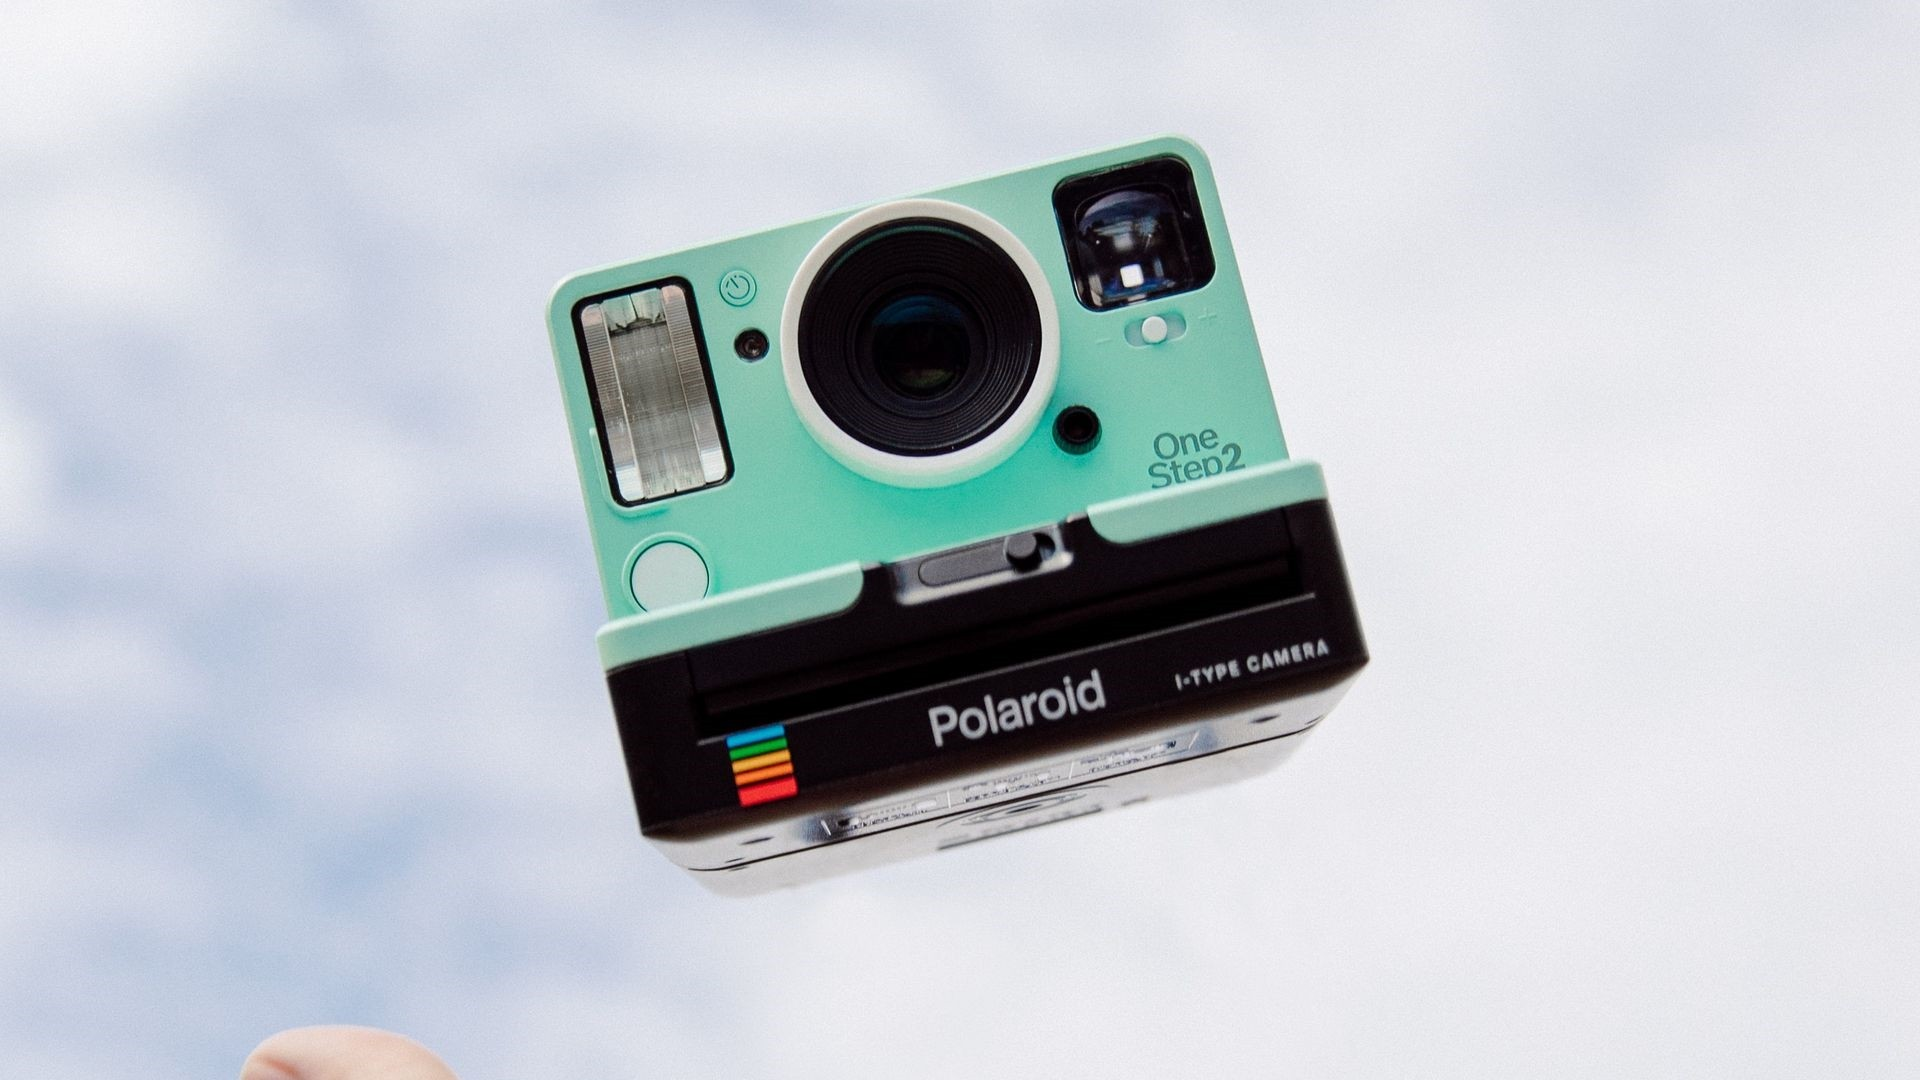 Polaroid hd wallpaper download